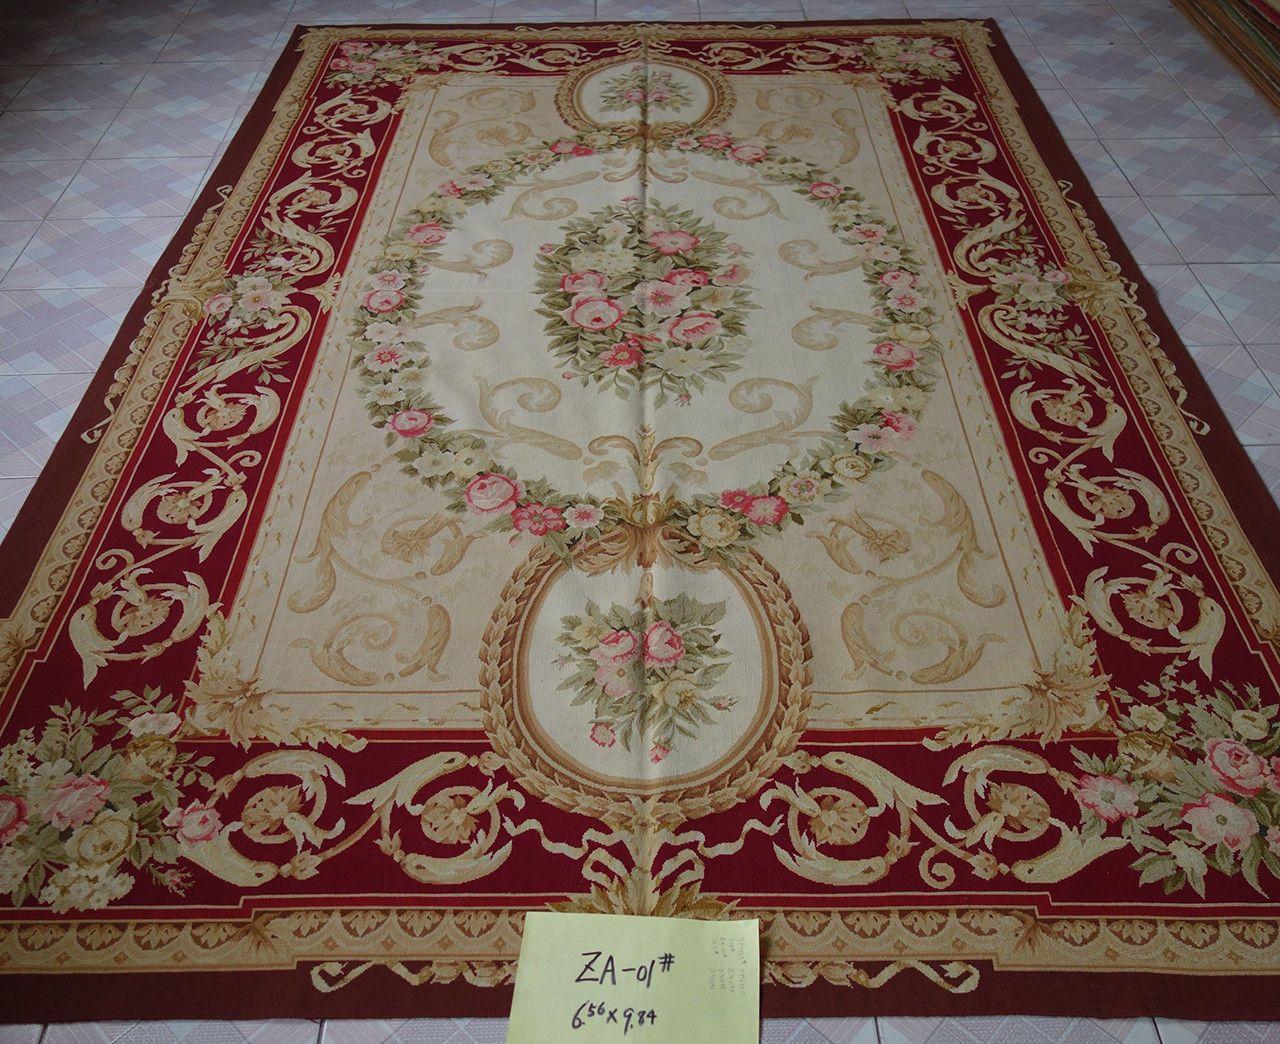 2m X 3m Beautiful Victorian Interior Burgandy Rose Garland Aubusson Rug